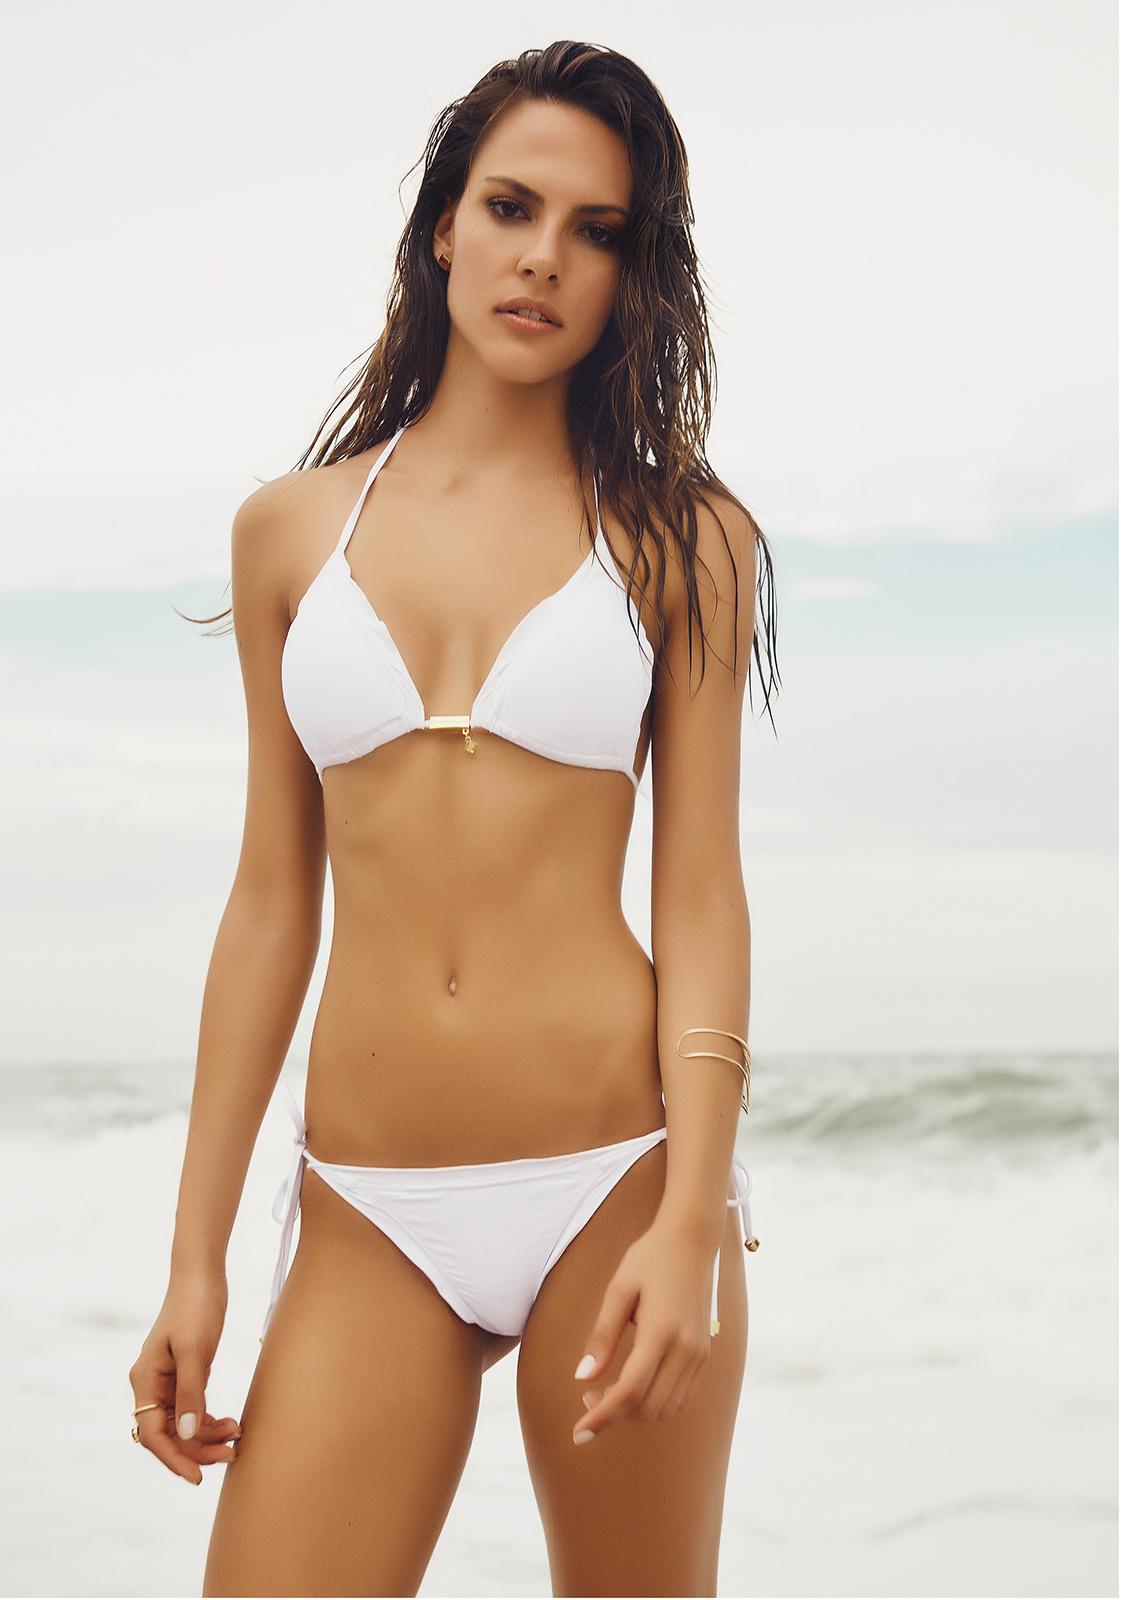 Larissa White Nude Photos 45